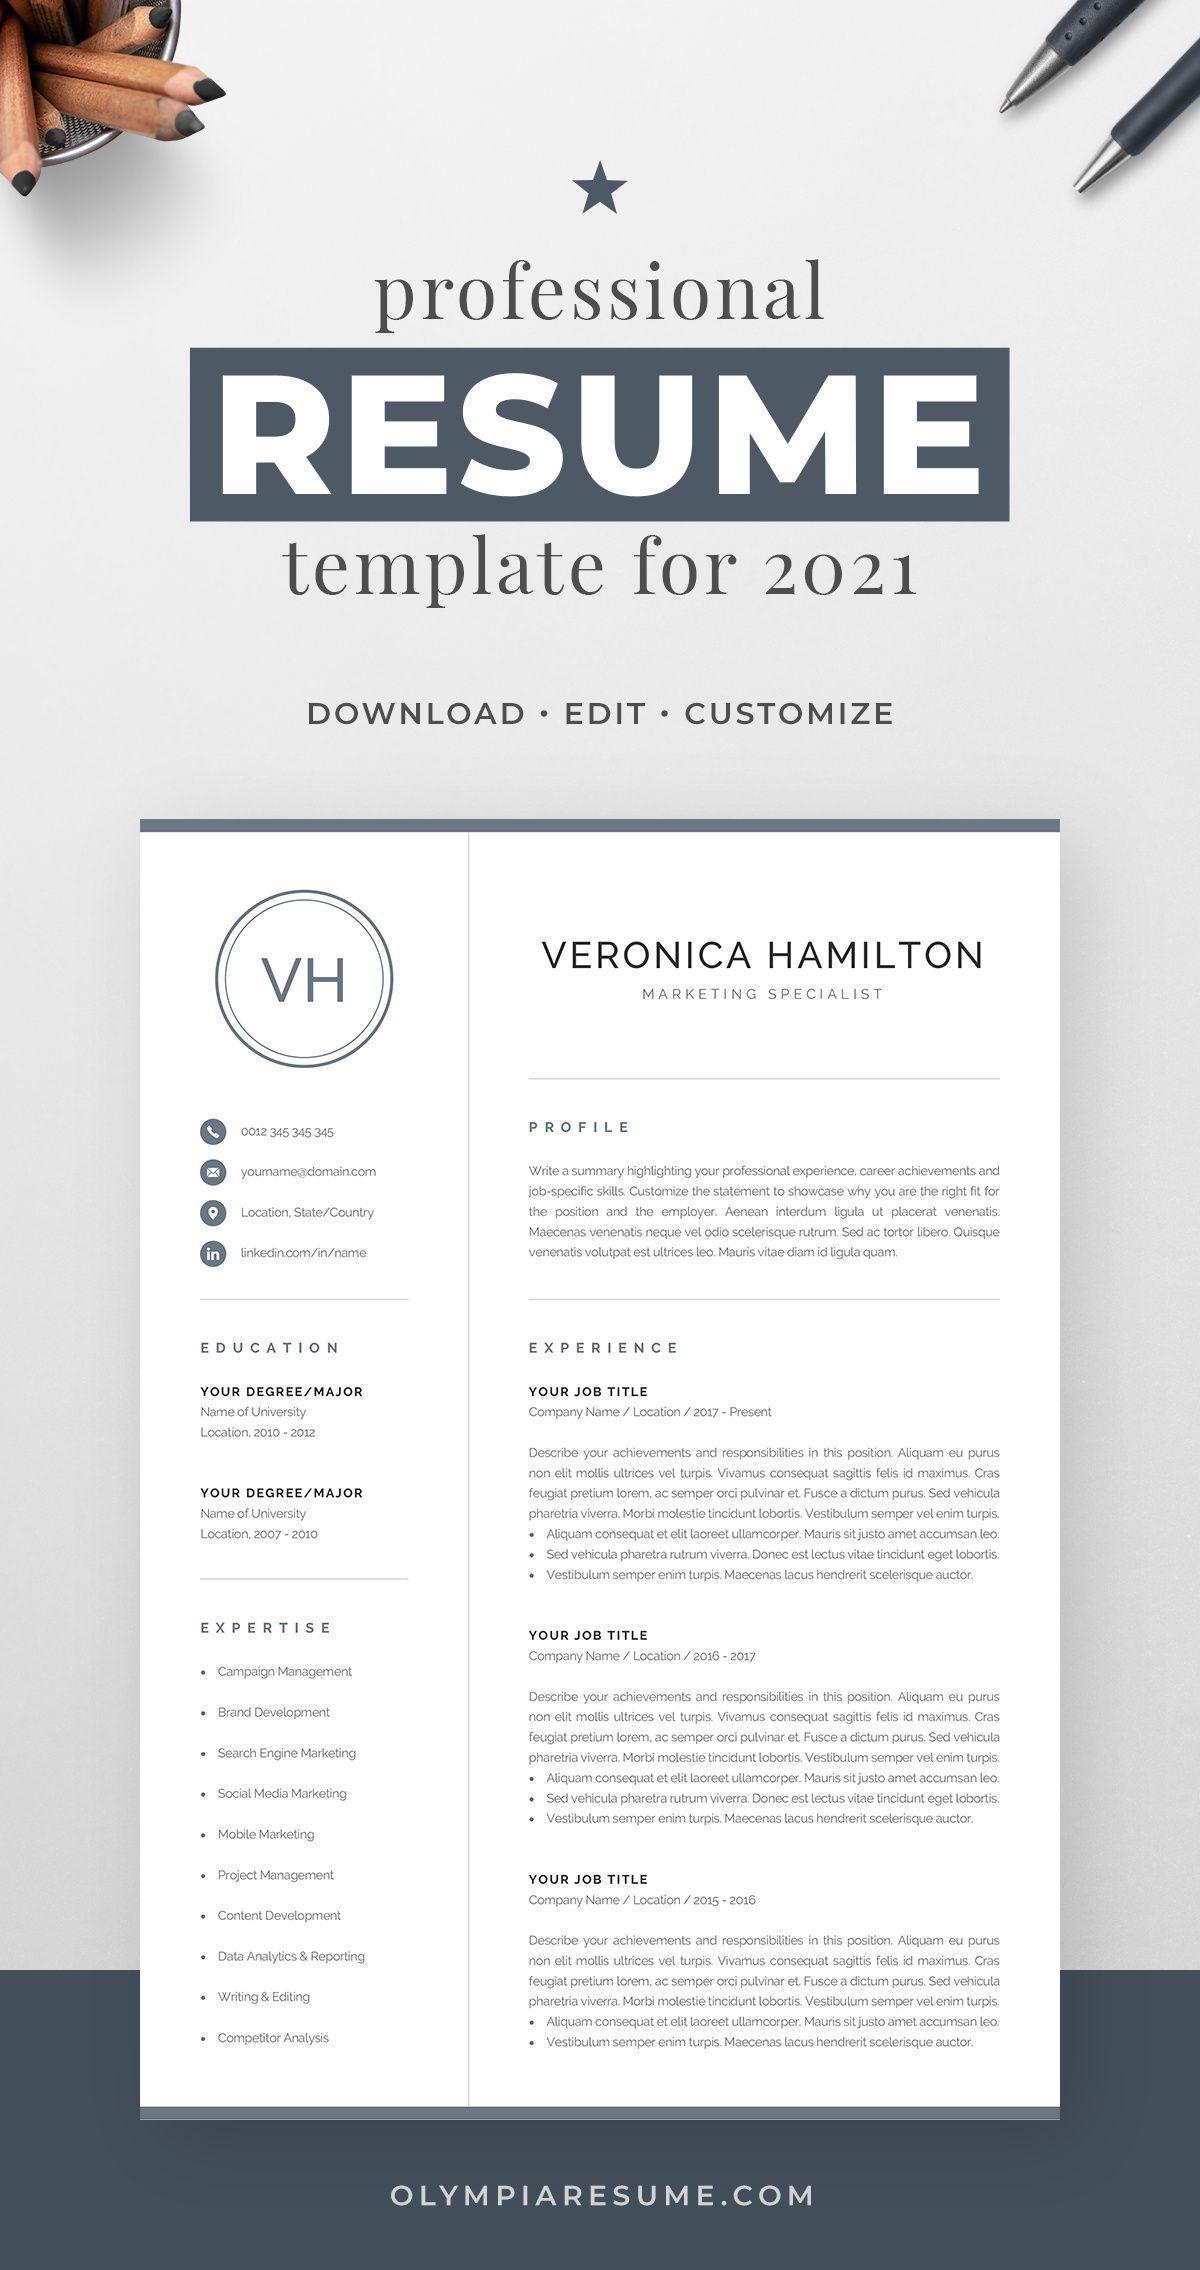 Resume Template With Monogram 1 2 Page Resume Modern Etsy In 2021 Resume Template Professional Resume Template One Page Resume Template